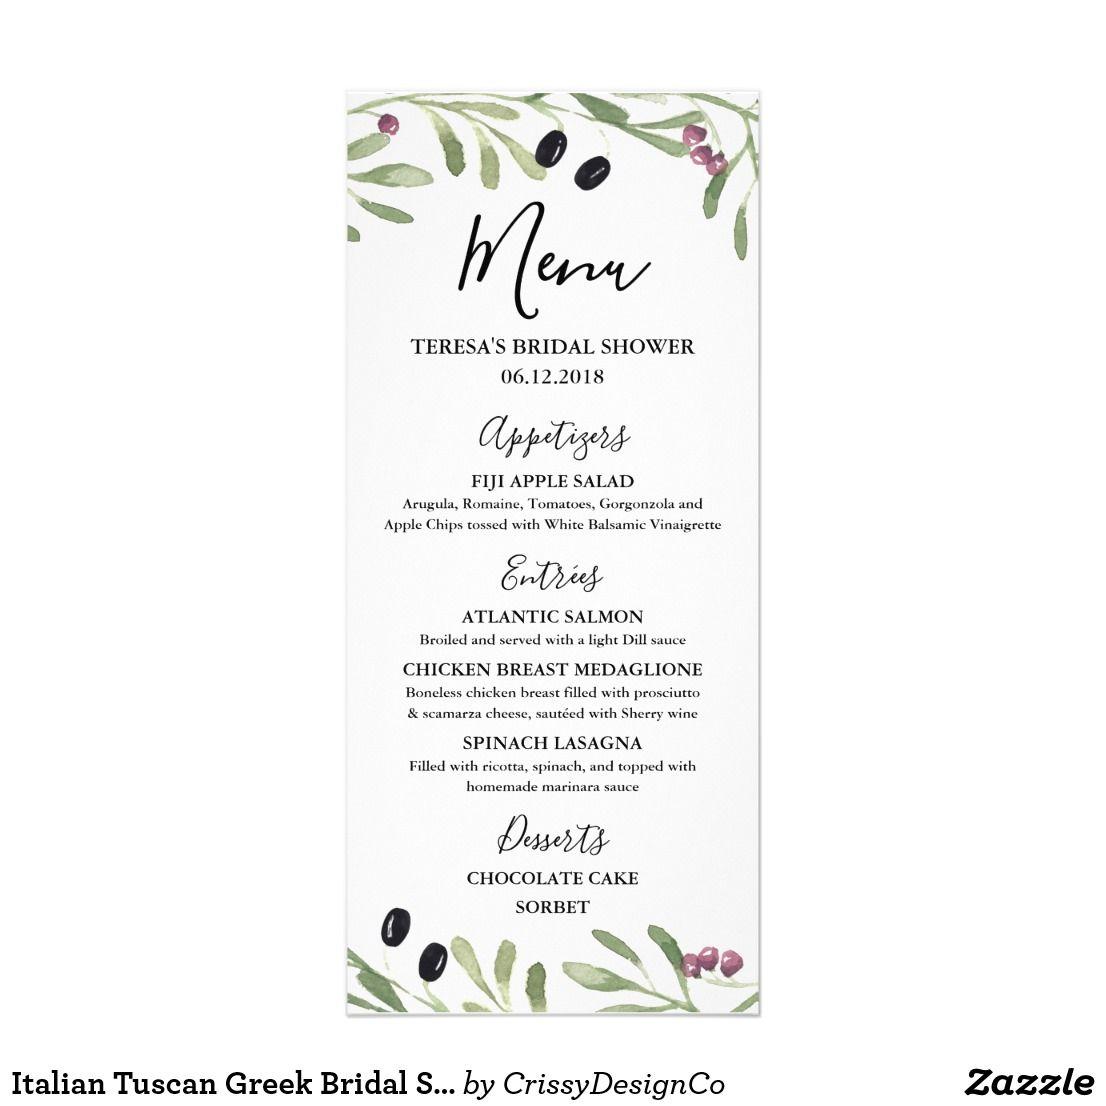 Italian tuscan greek bridal shower wedding menu rehearsal dinner